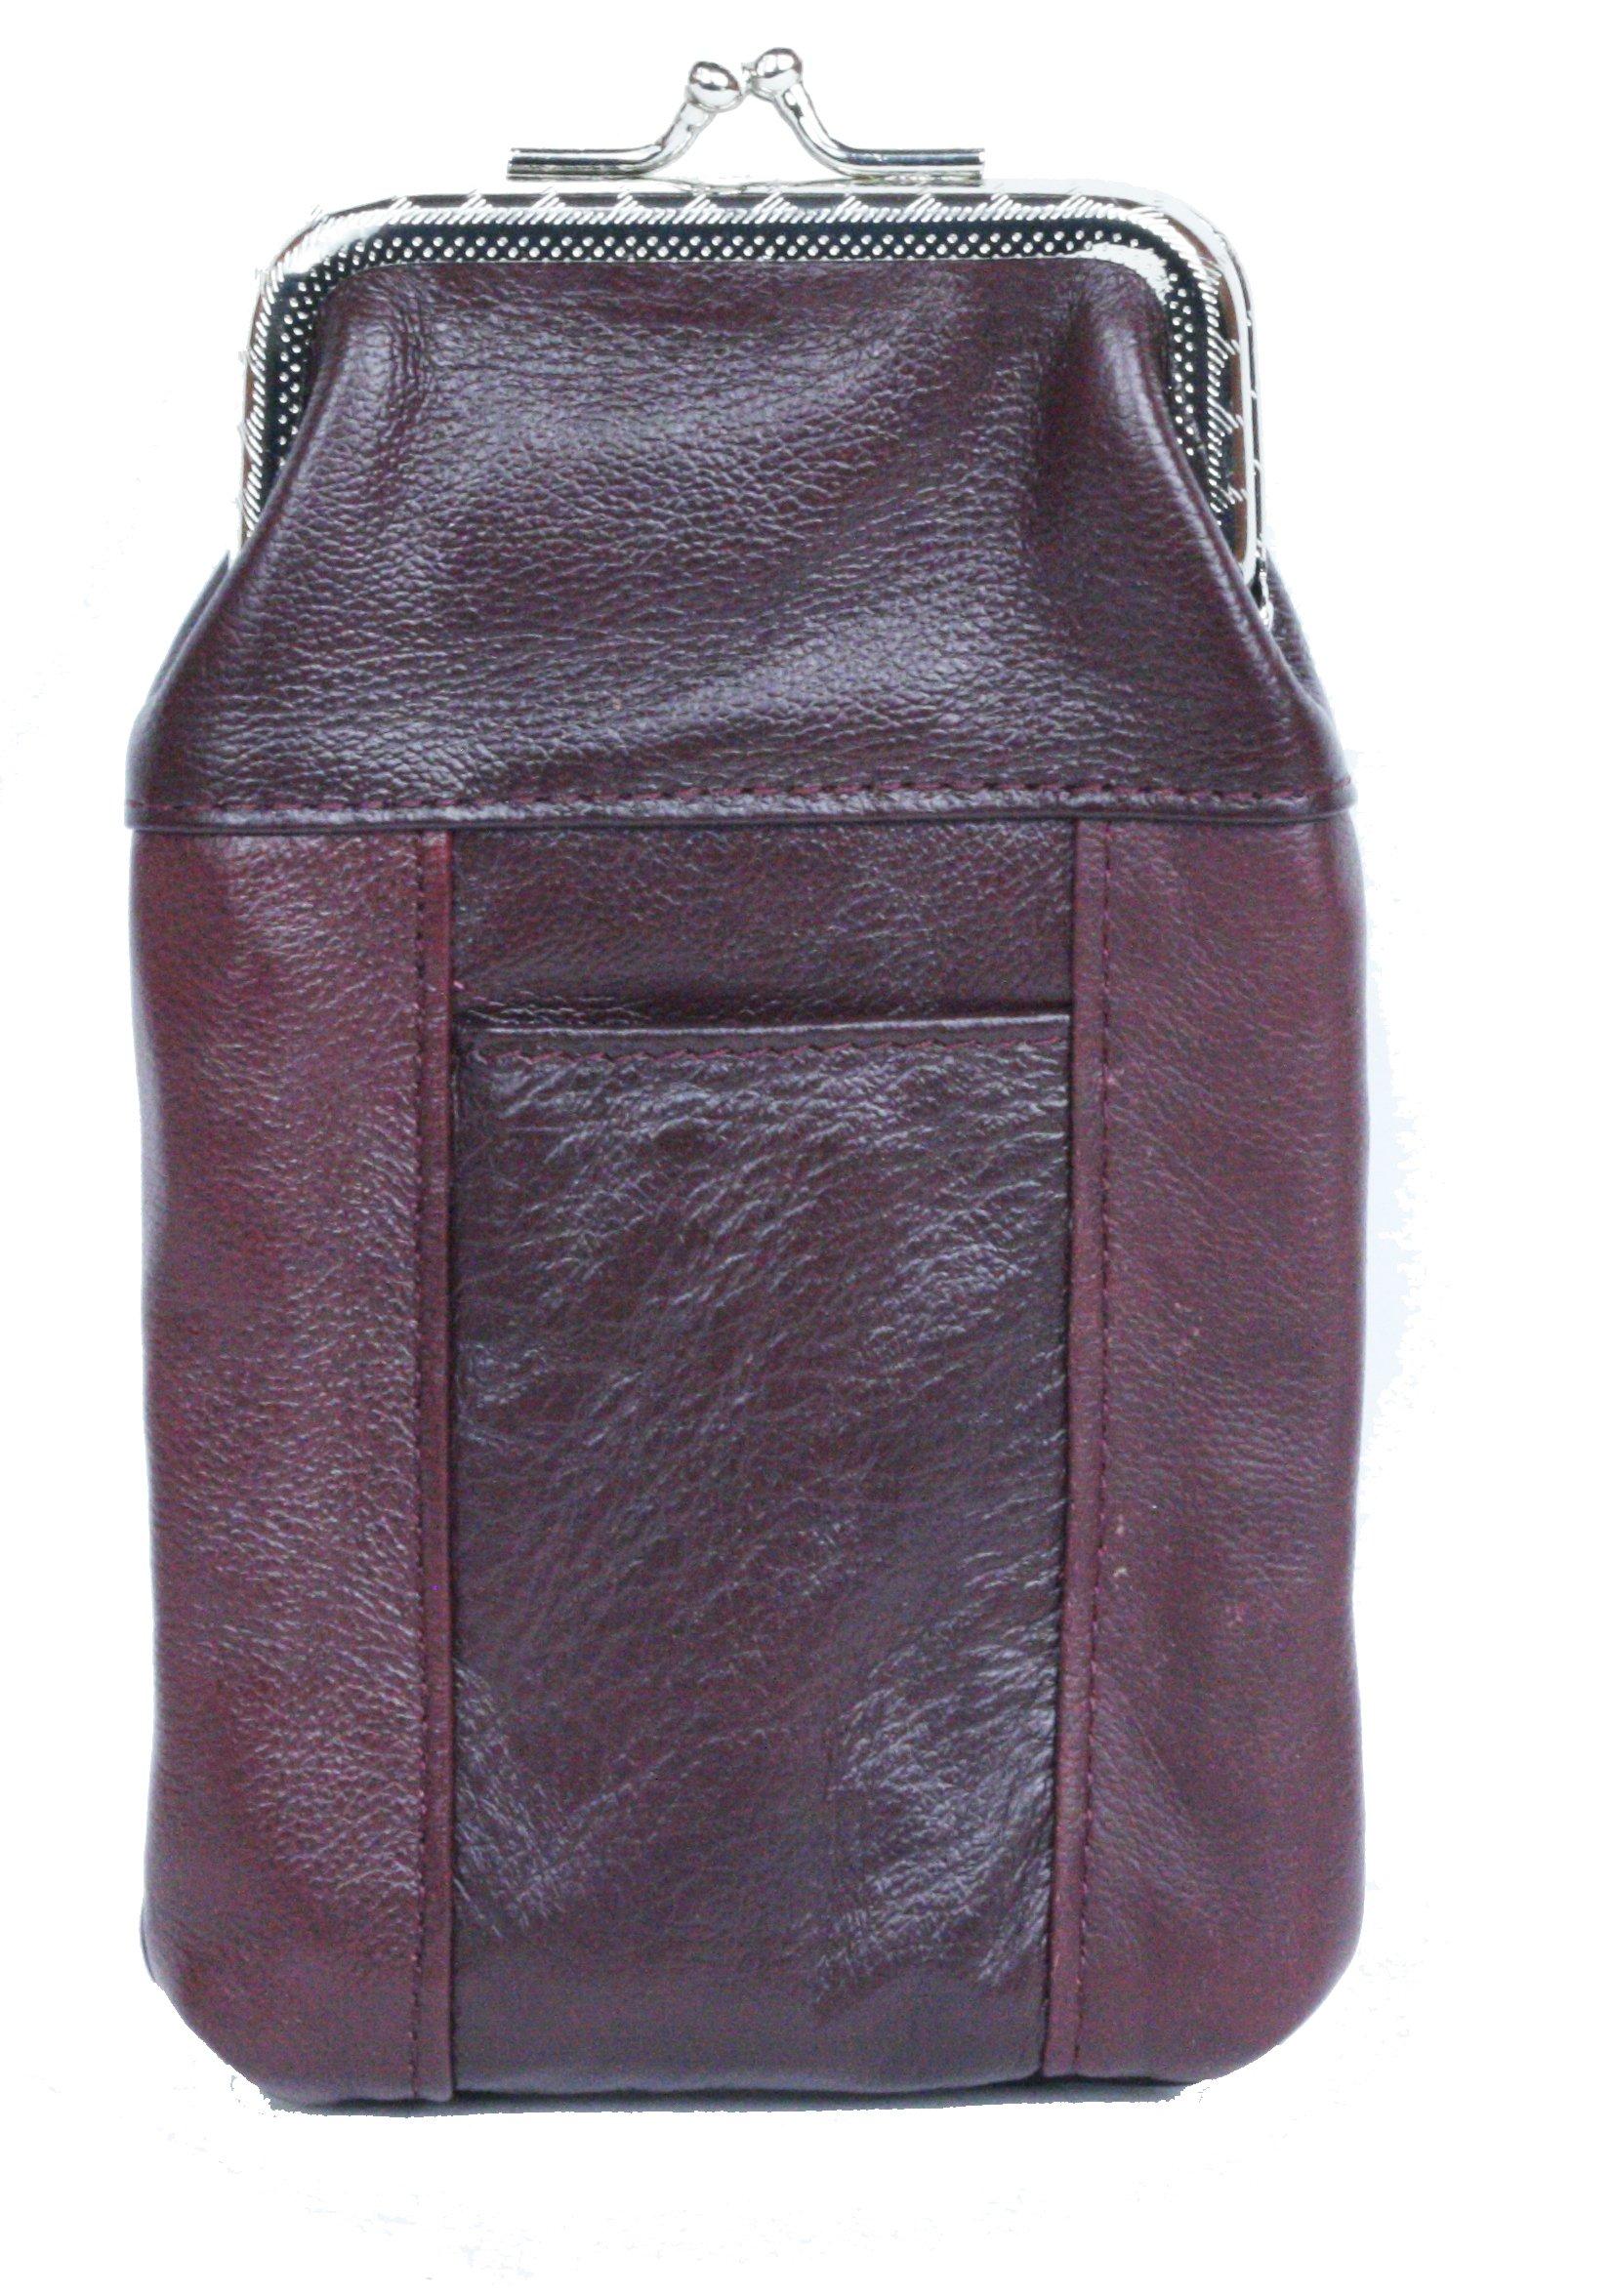 Womens Leather Cigarette Case & Lighter Holder Wine